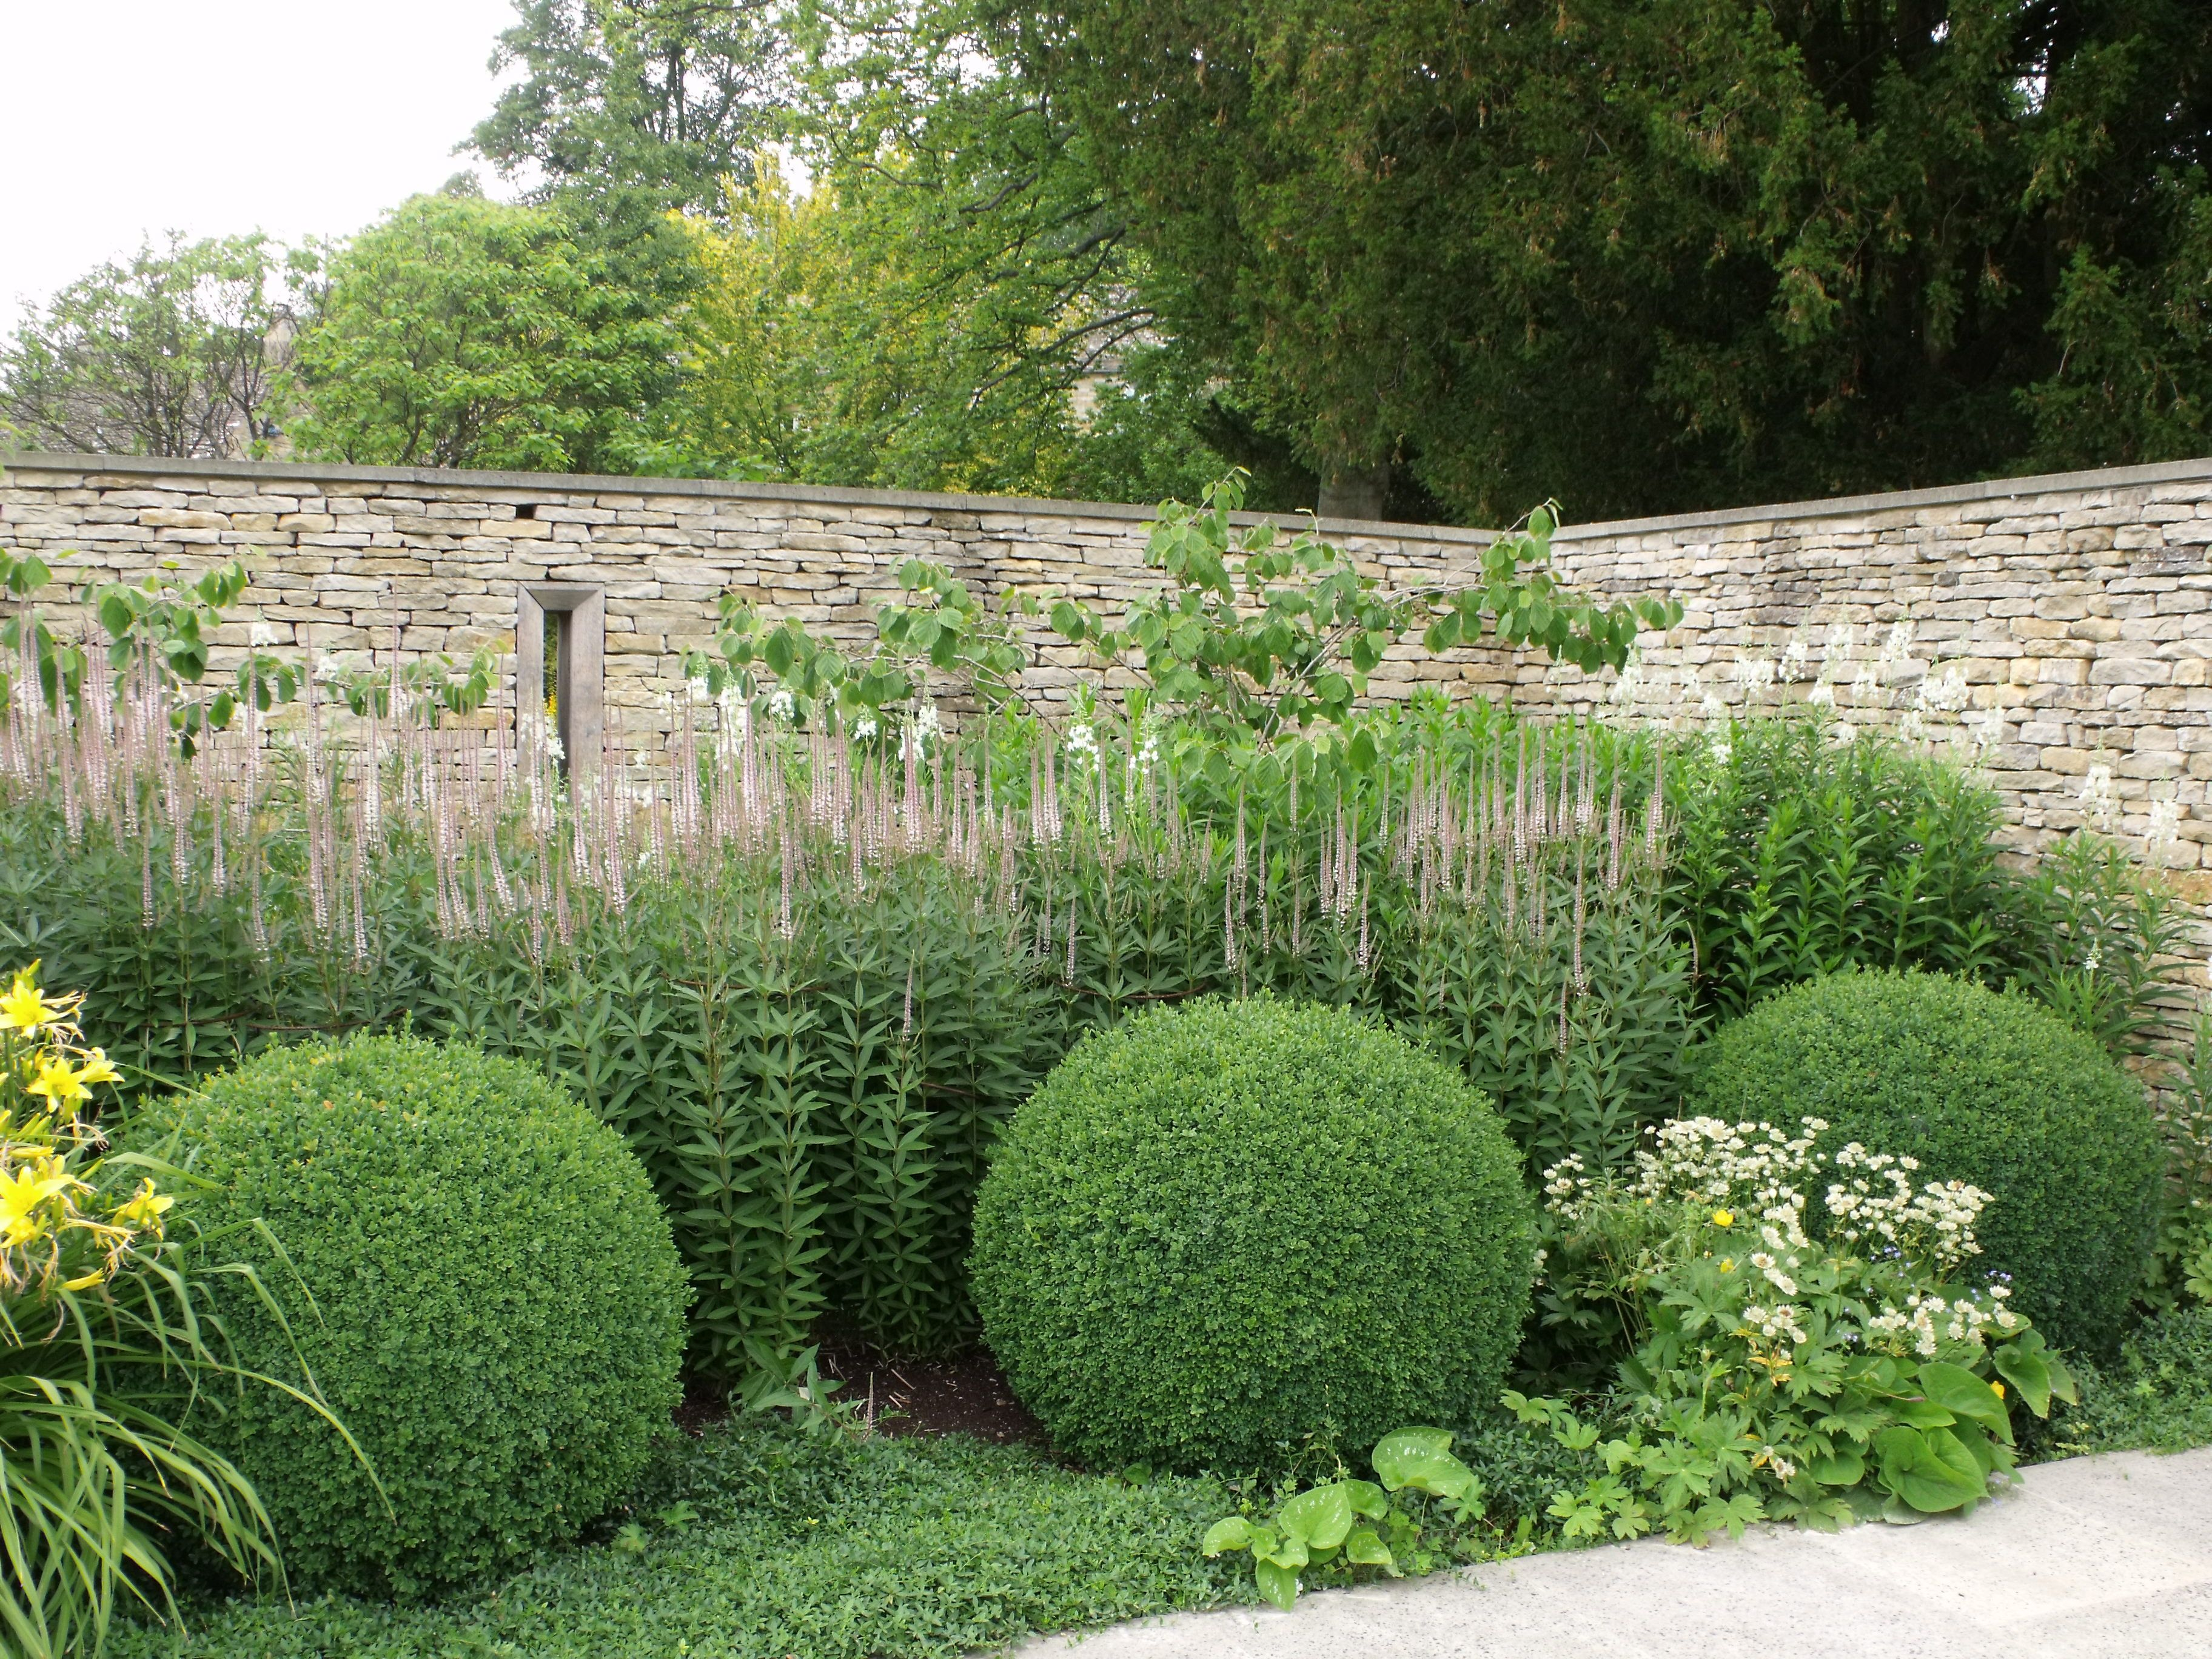 Dan Pearson Garden Just Beautiful Beautiful Gardens Gorgeous Gardens Garden Inspiration